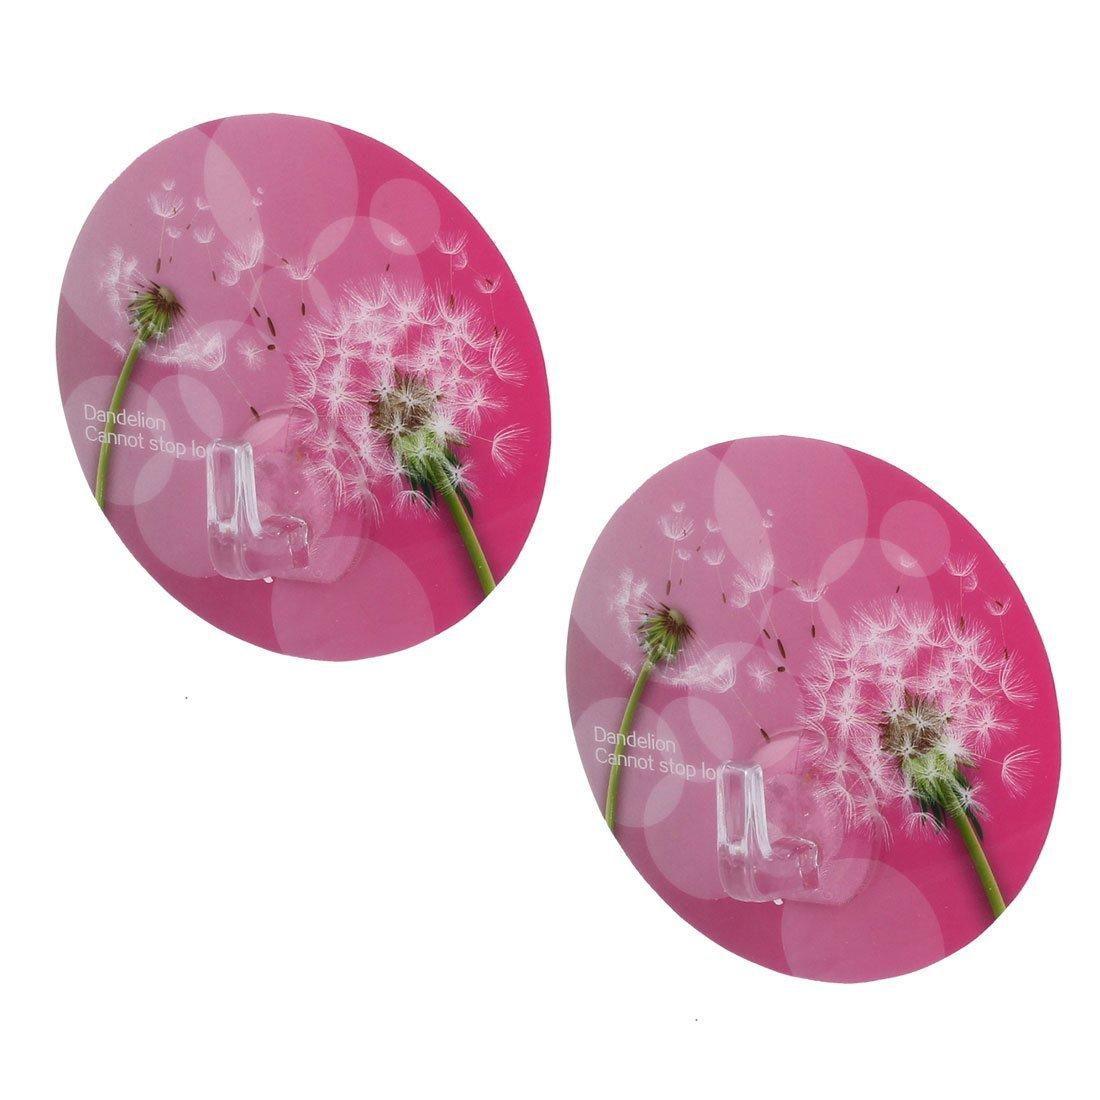 uxcell Dandelion Pattern PVC Bathroom Round Shape No Scratch Grass Wall Hanging Seamless Adhesive Hook 2pcs Fuchsia